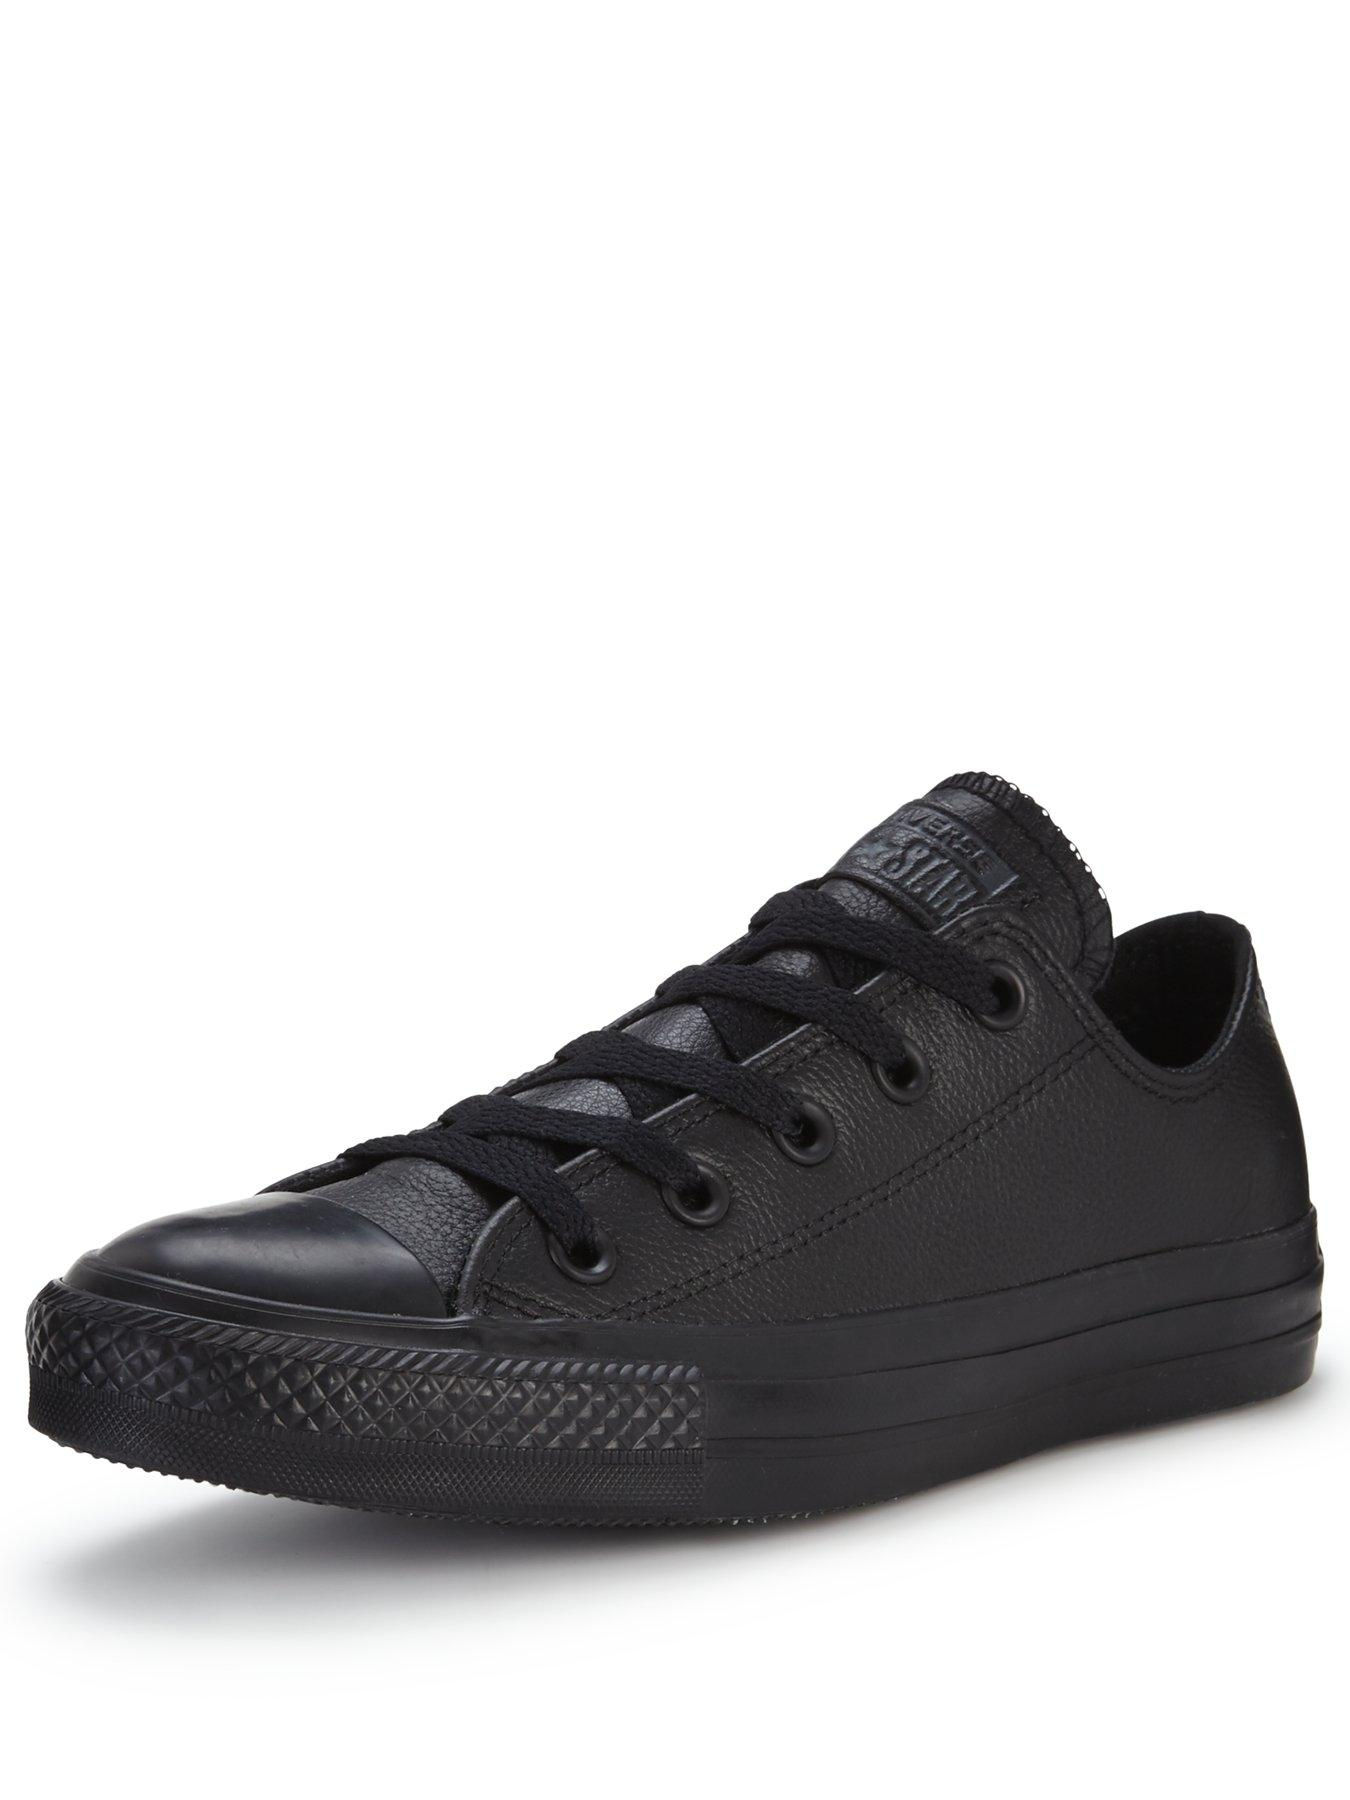 fully black converse